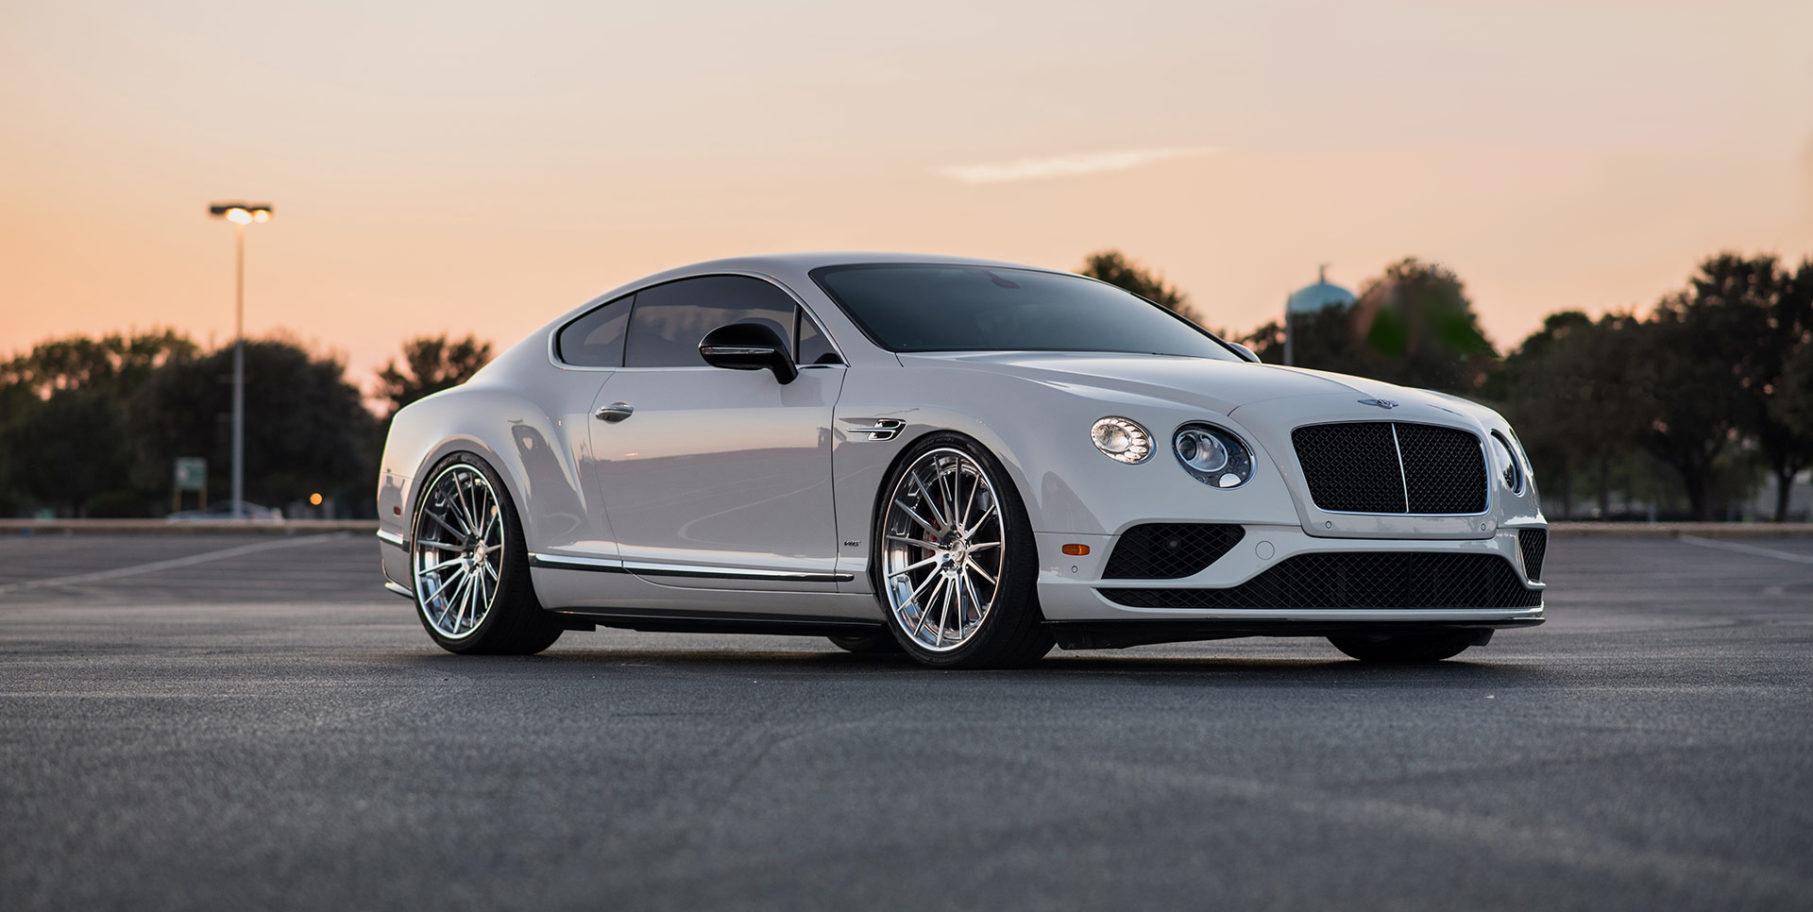 white-bentley-22-inch-chrome-multi-spoke-rims-houston-luxury-car-m.jpg